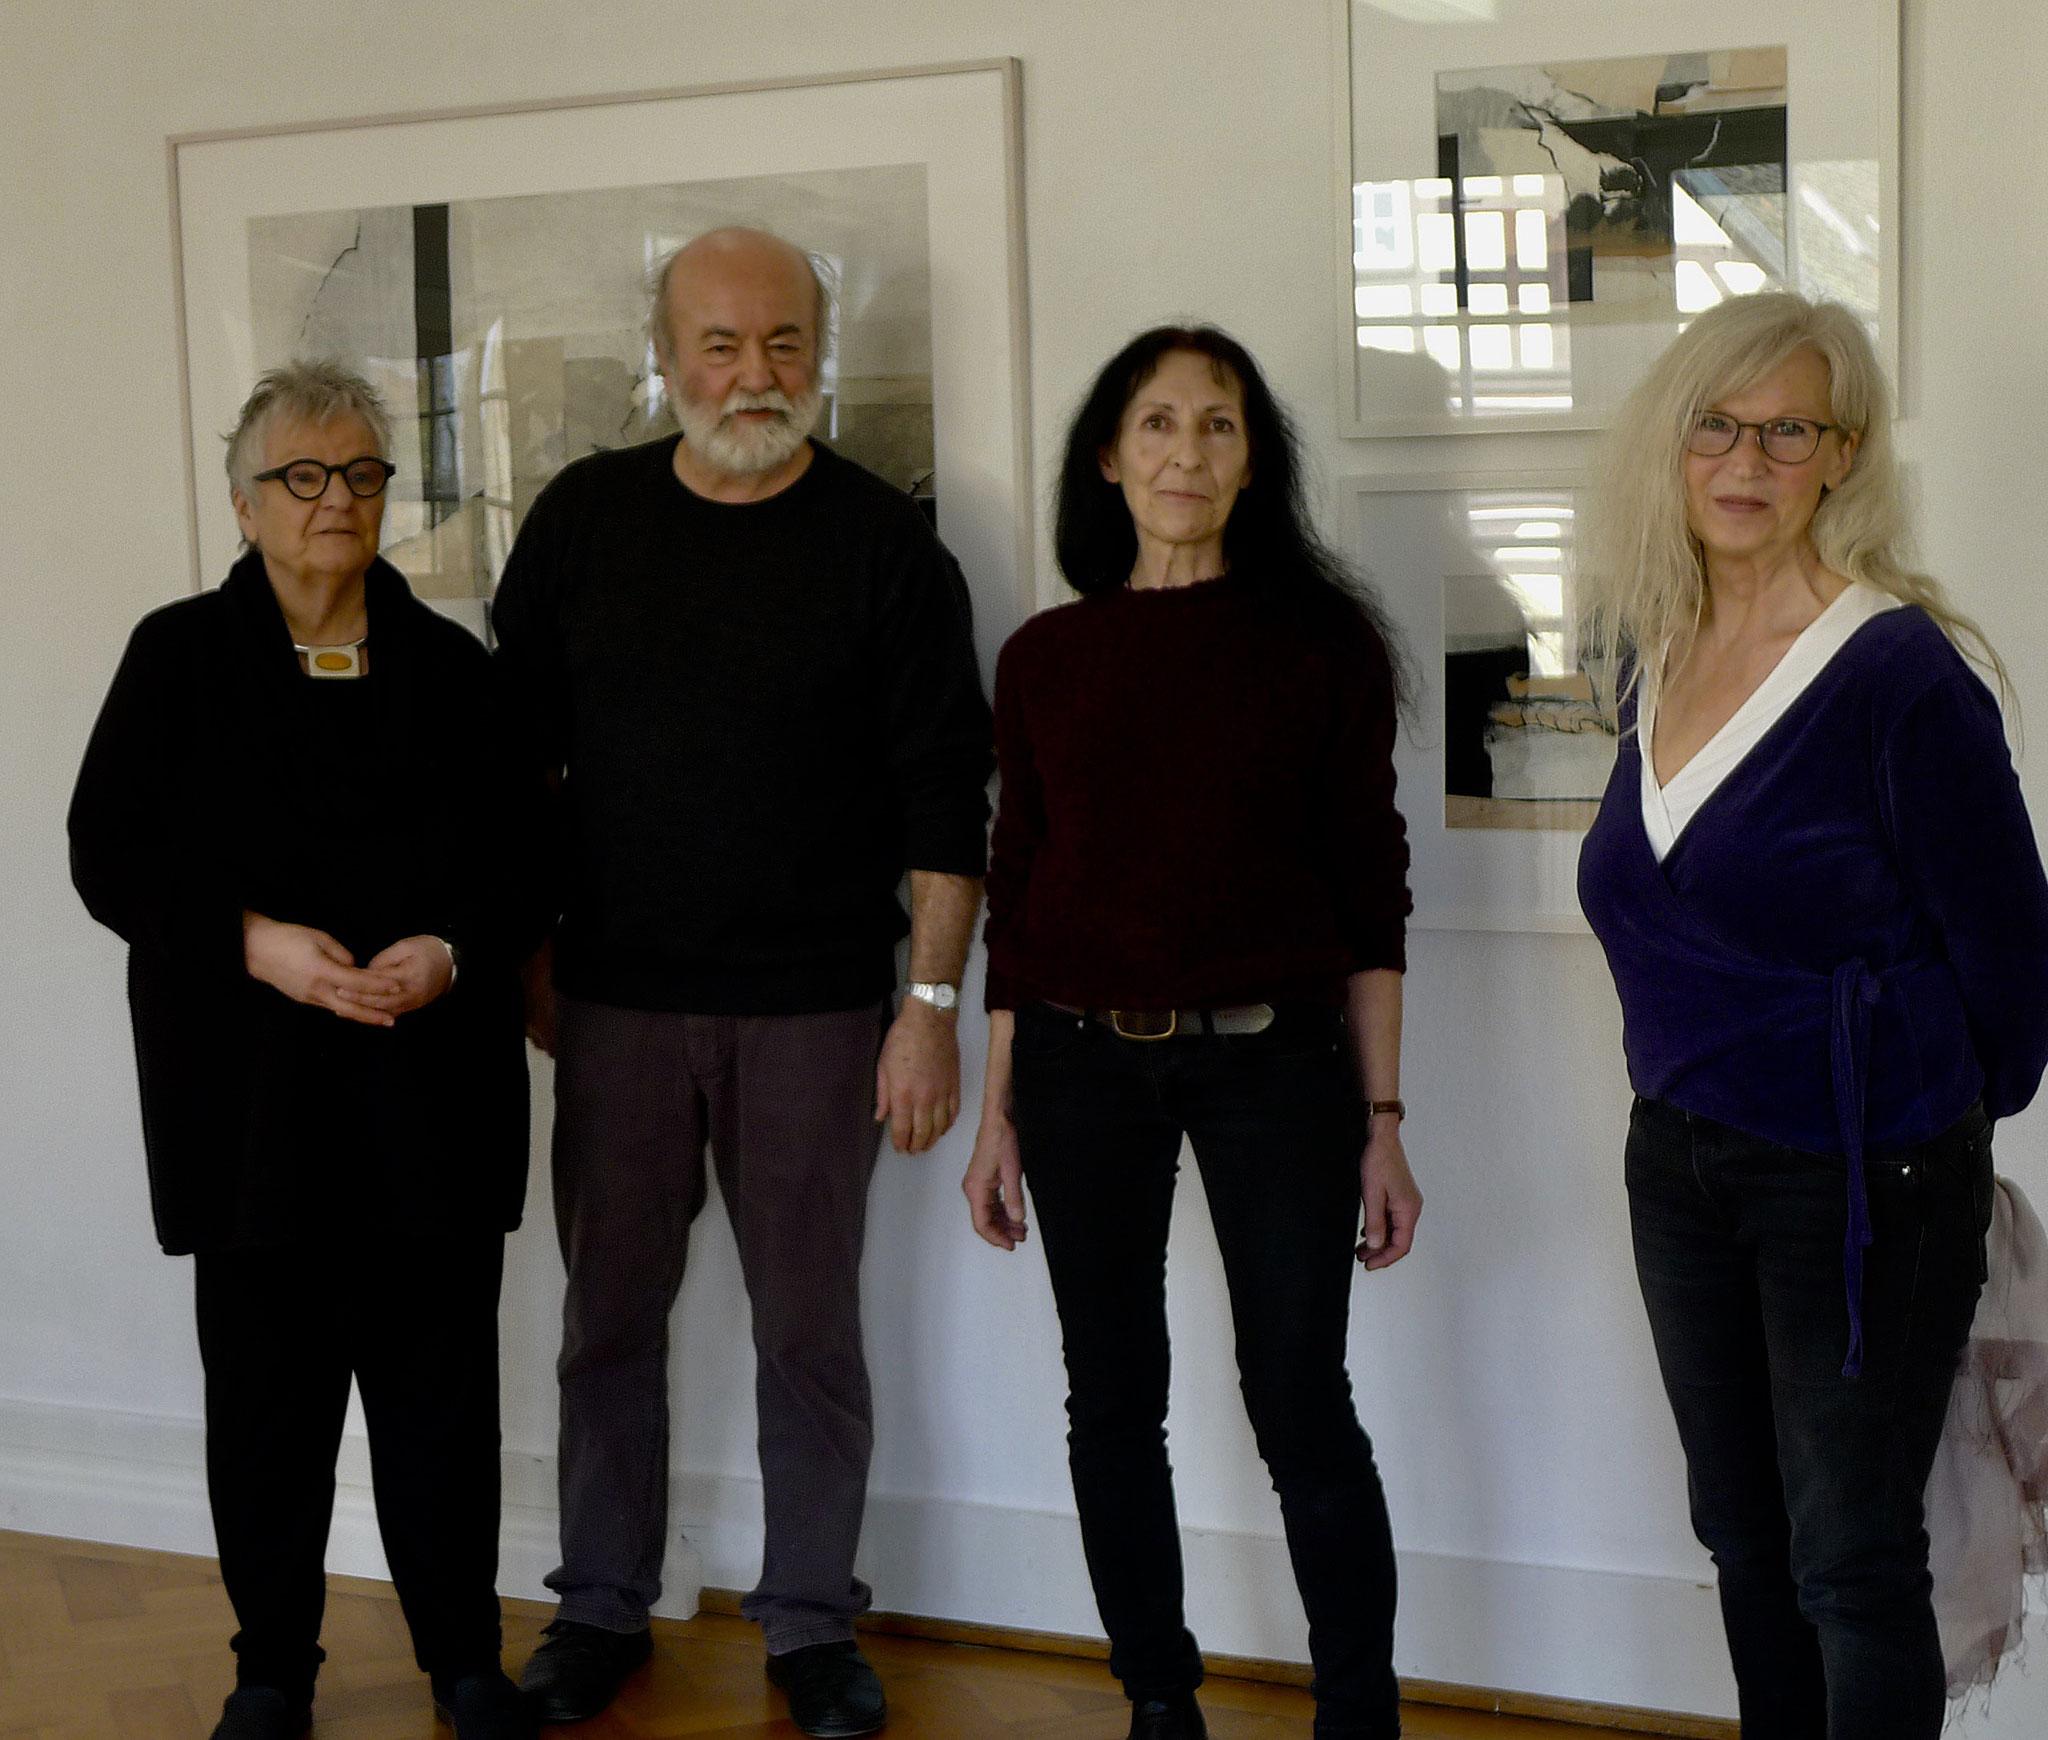 v.l.n.r.: Reingard Glass, Franz Raßl (HKV), Ursula Kensy, Renate Ziegler (HKV)